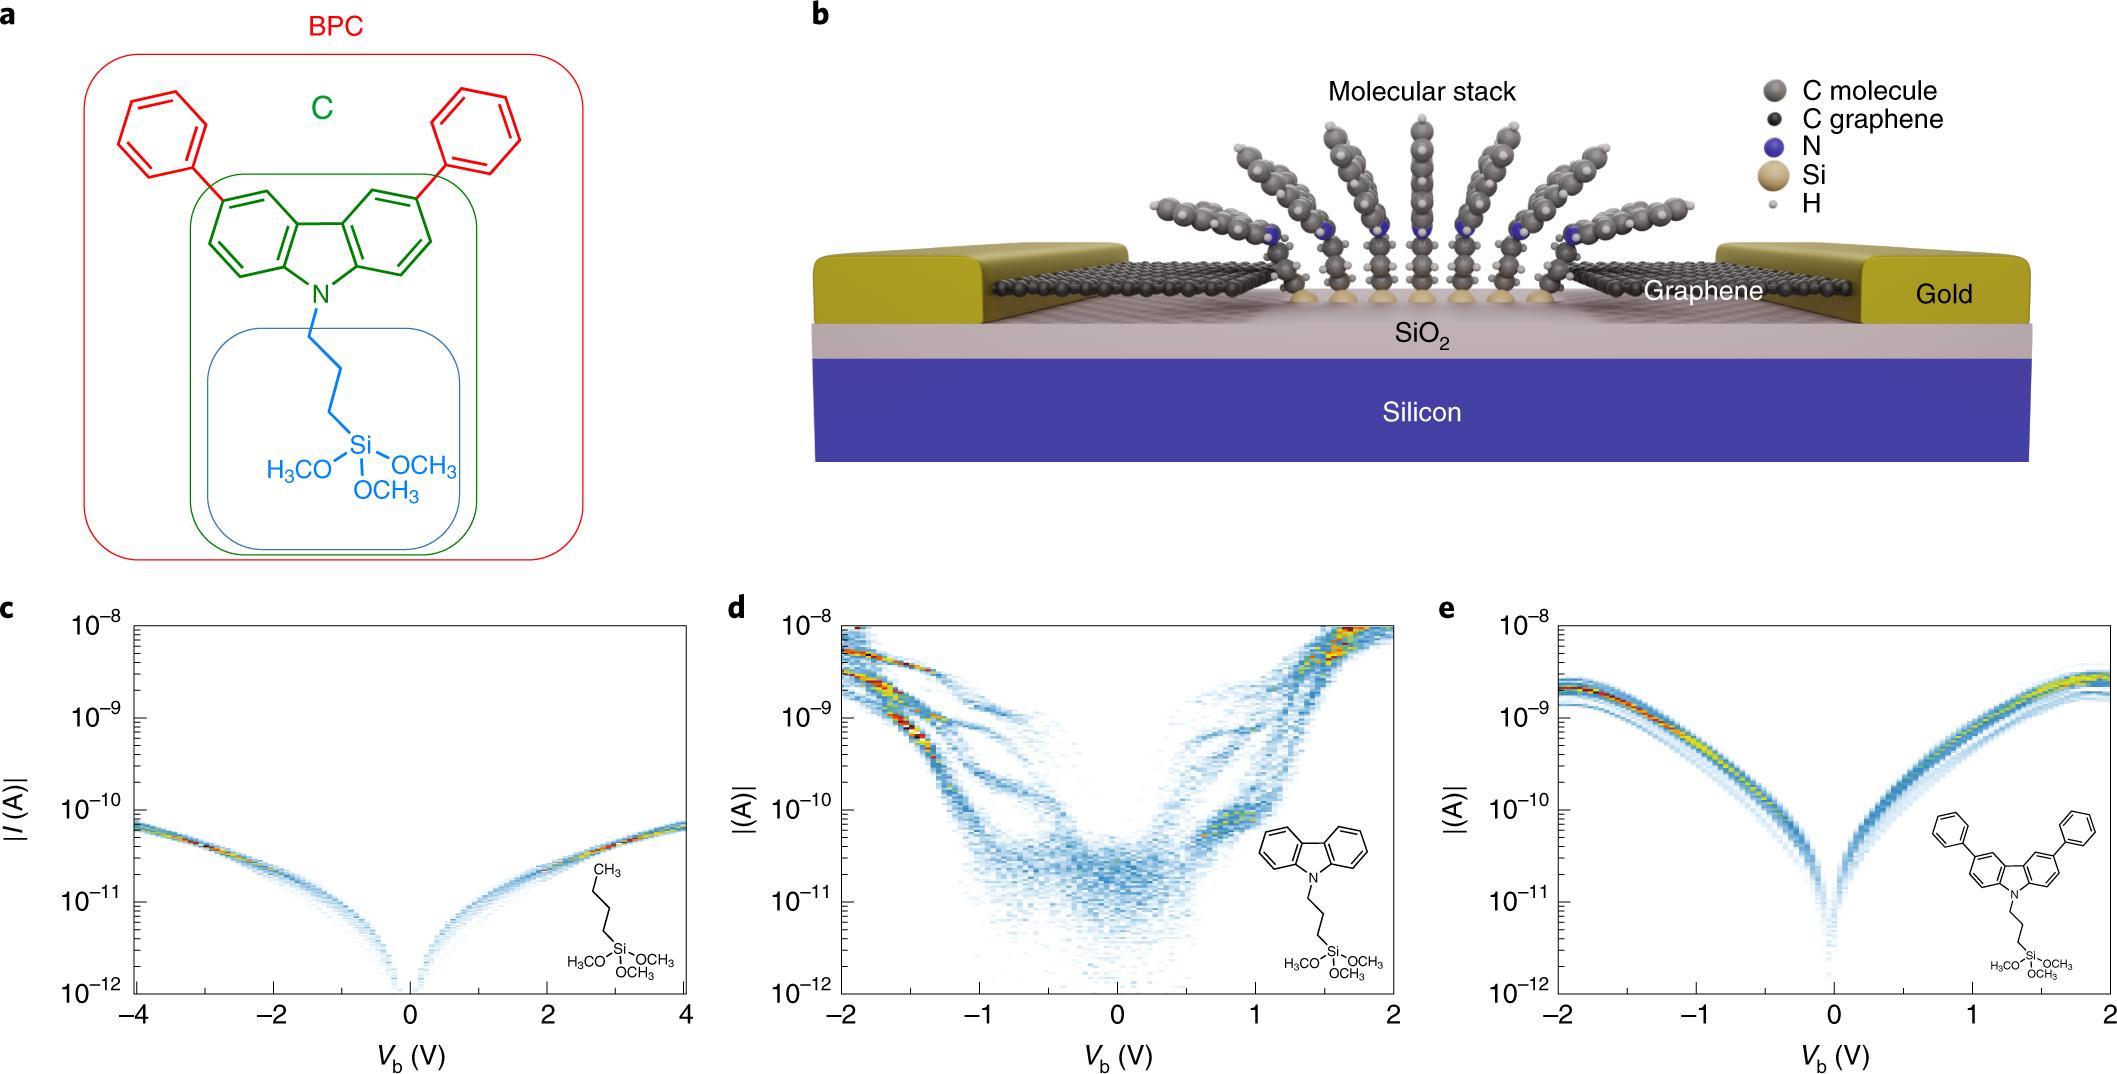 Robust graphene-based molecular devices